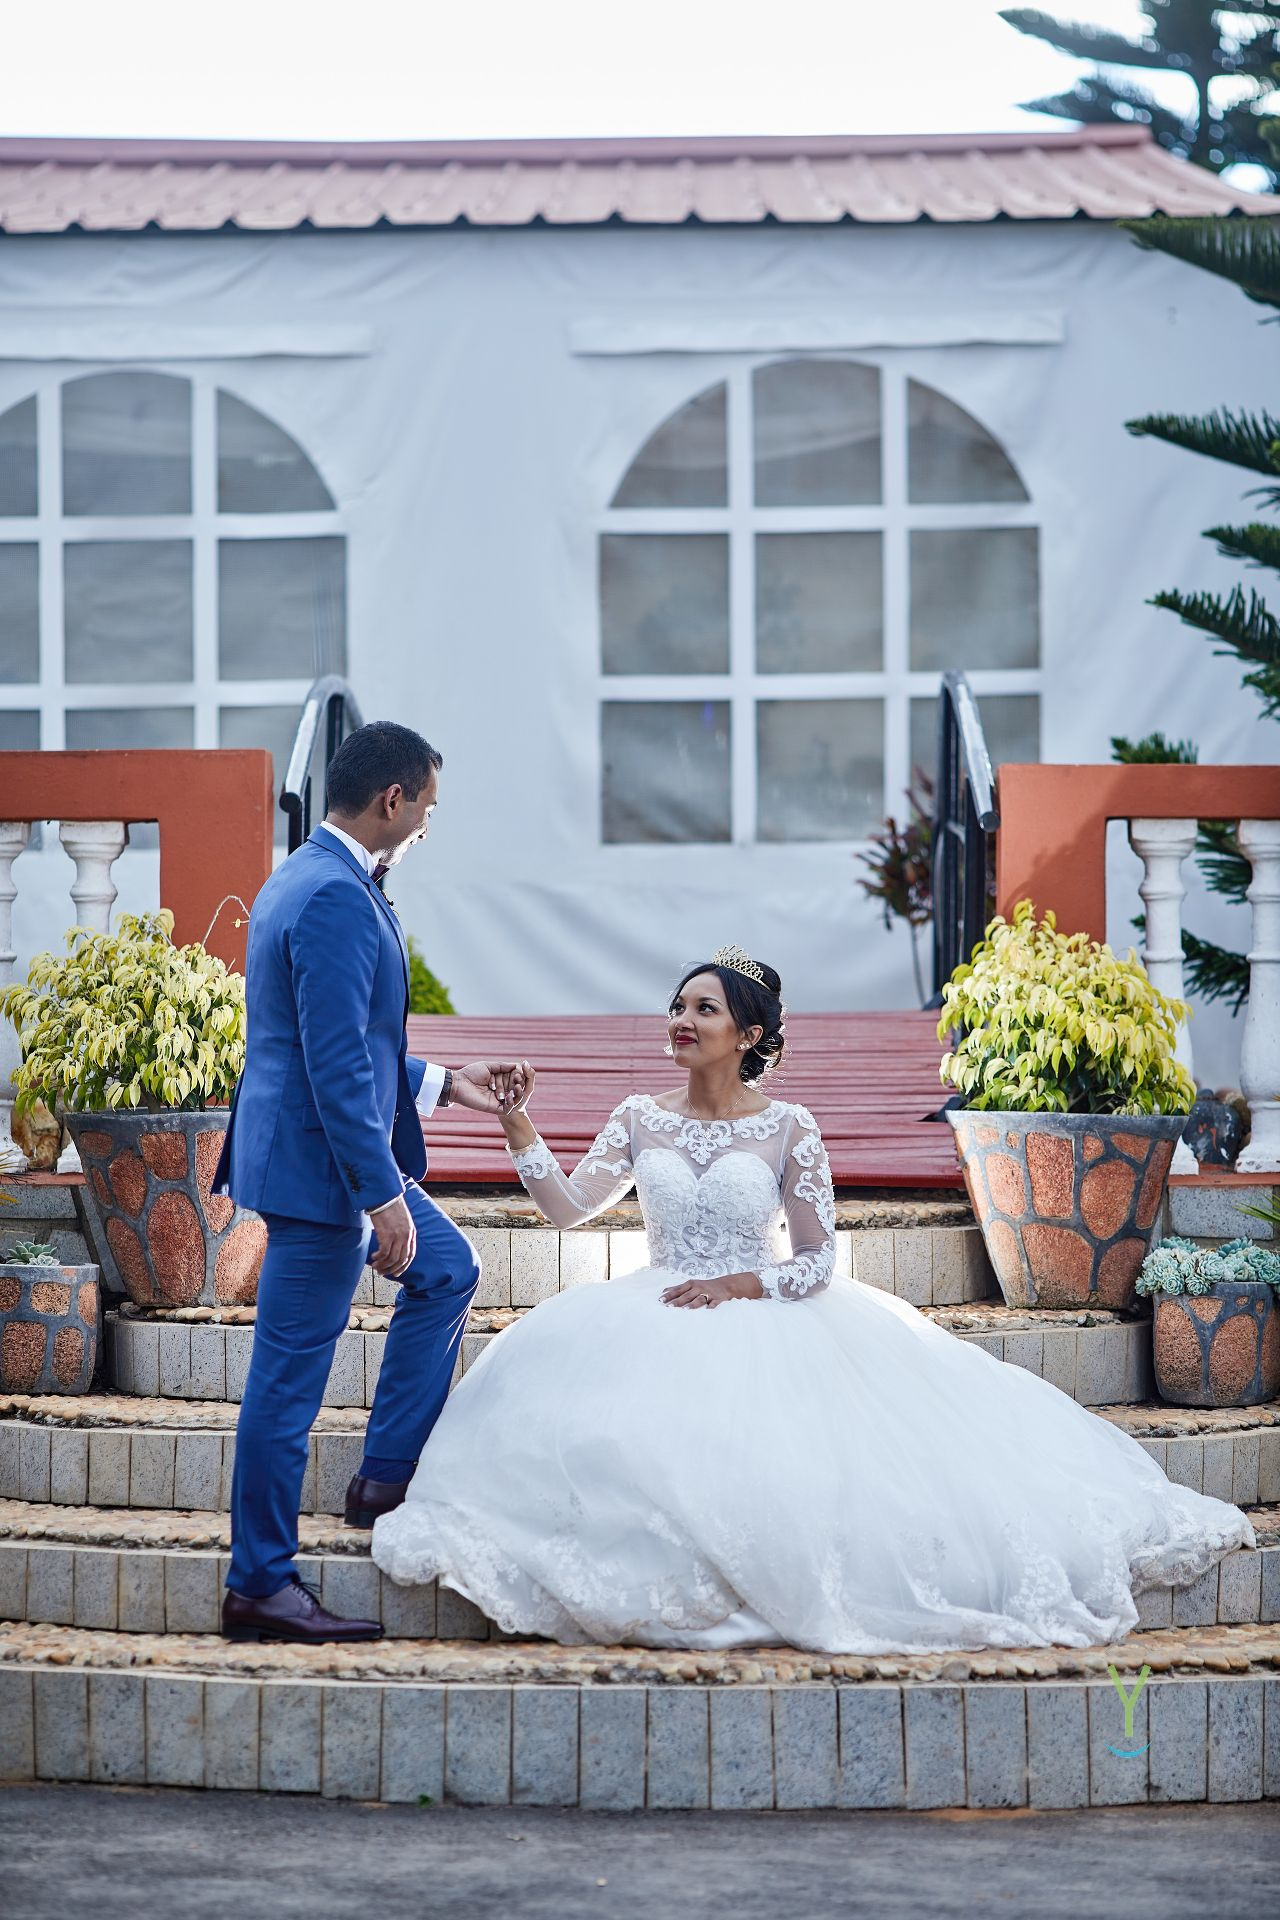 Photographe www.ymagoo.com